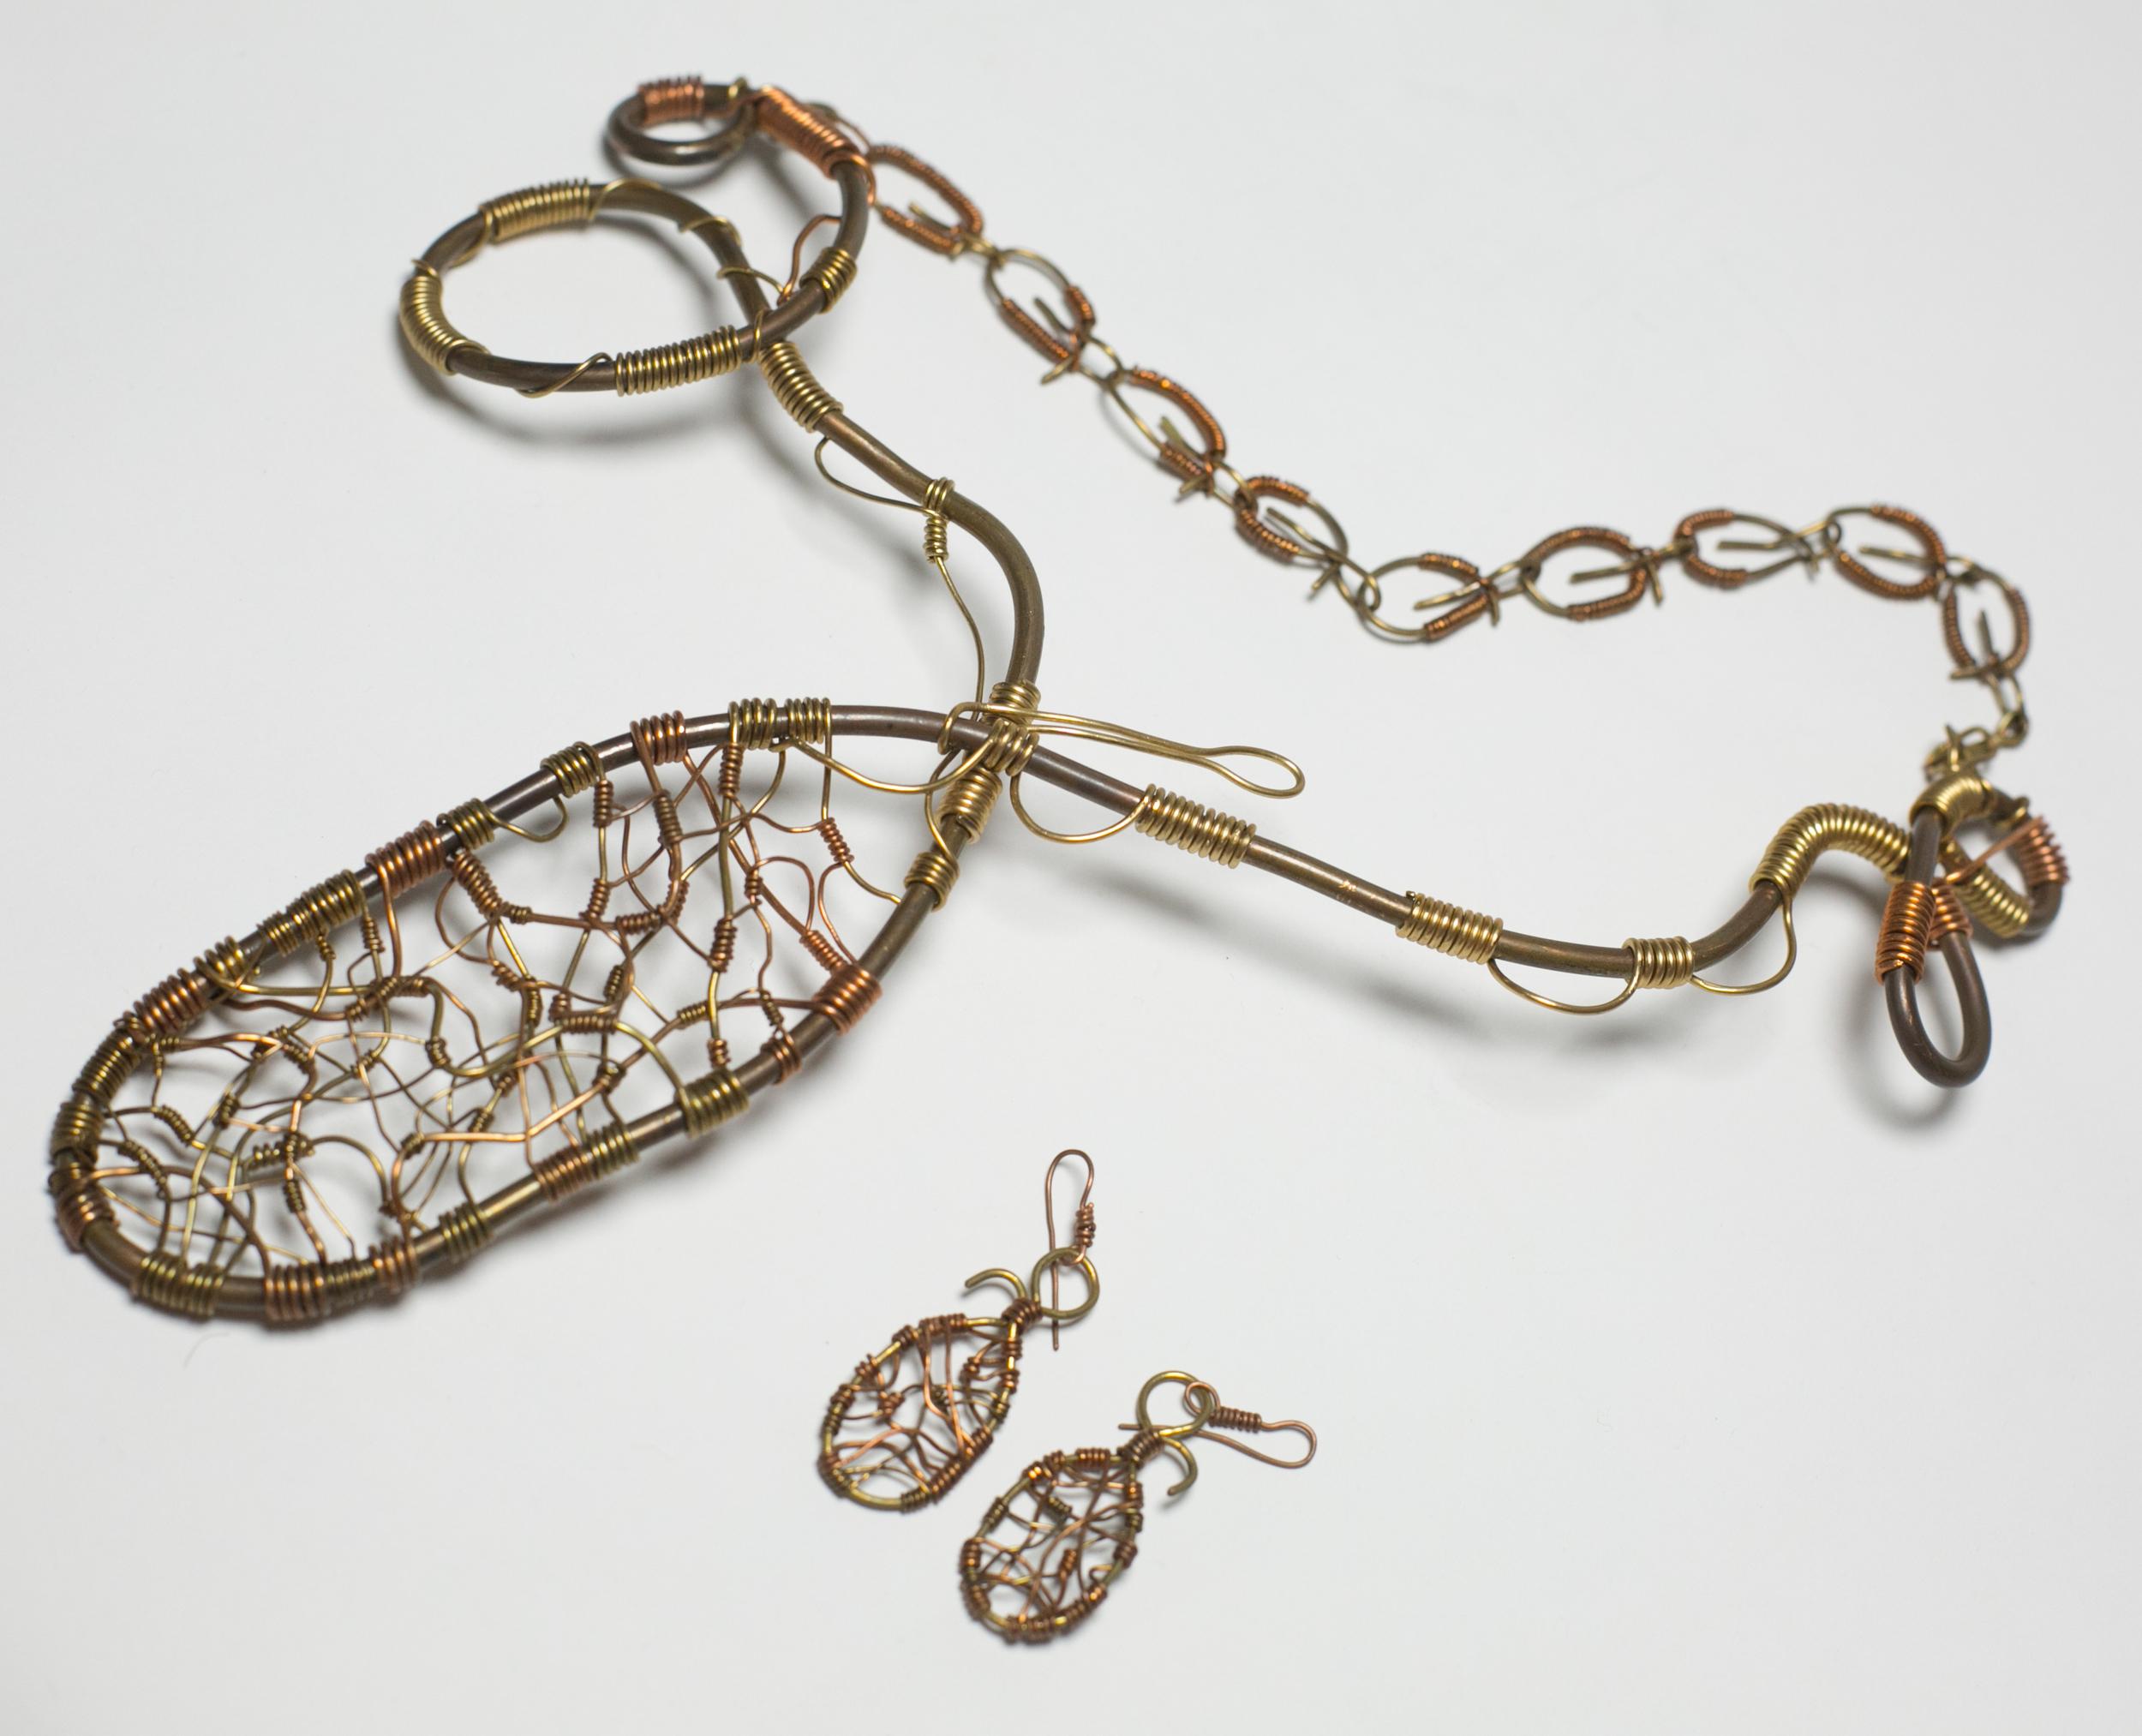 Royal House of Benin Necklace Set